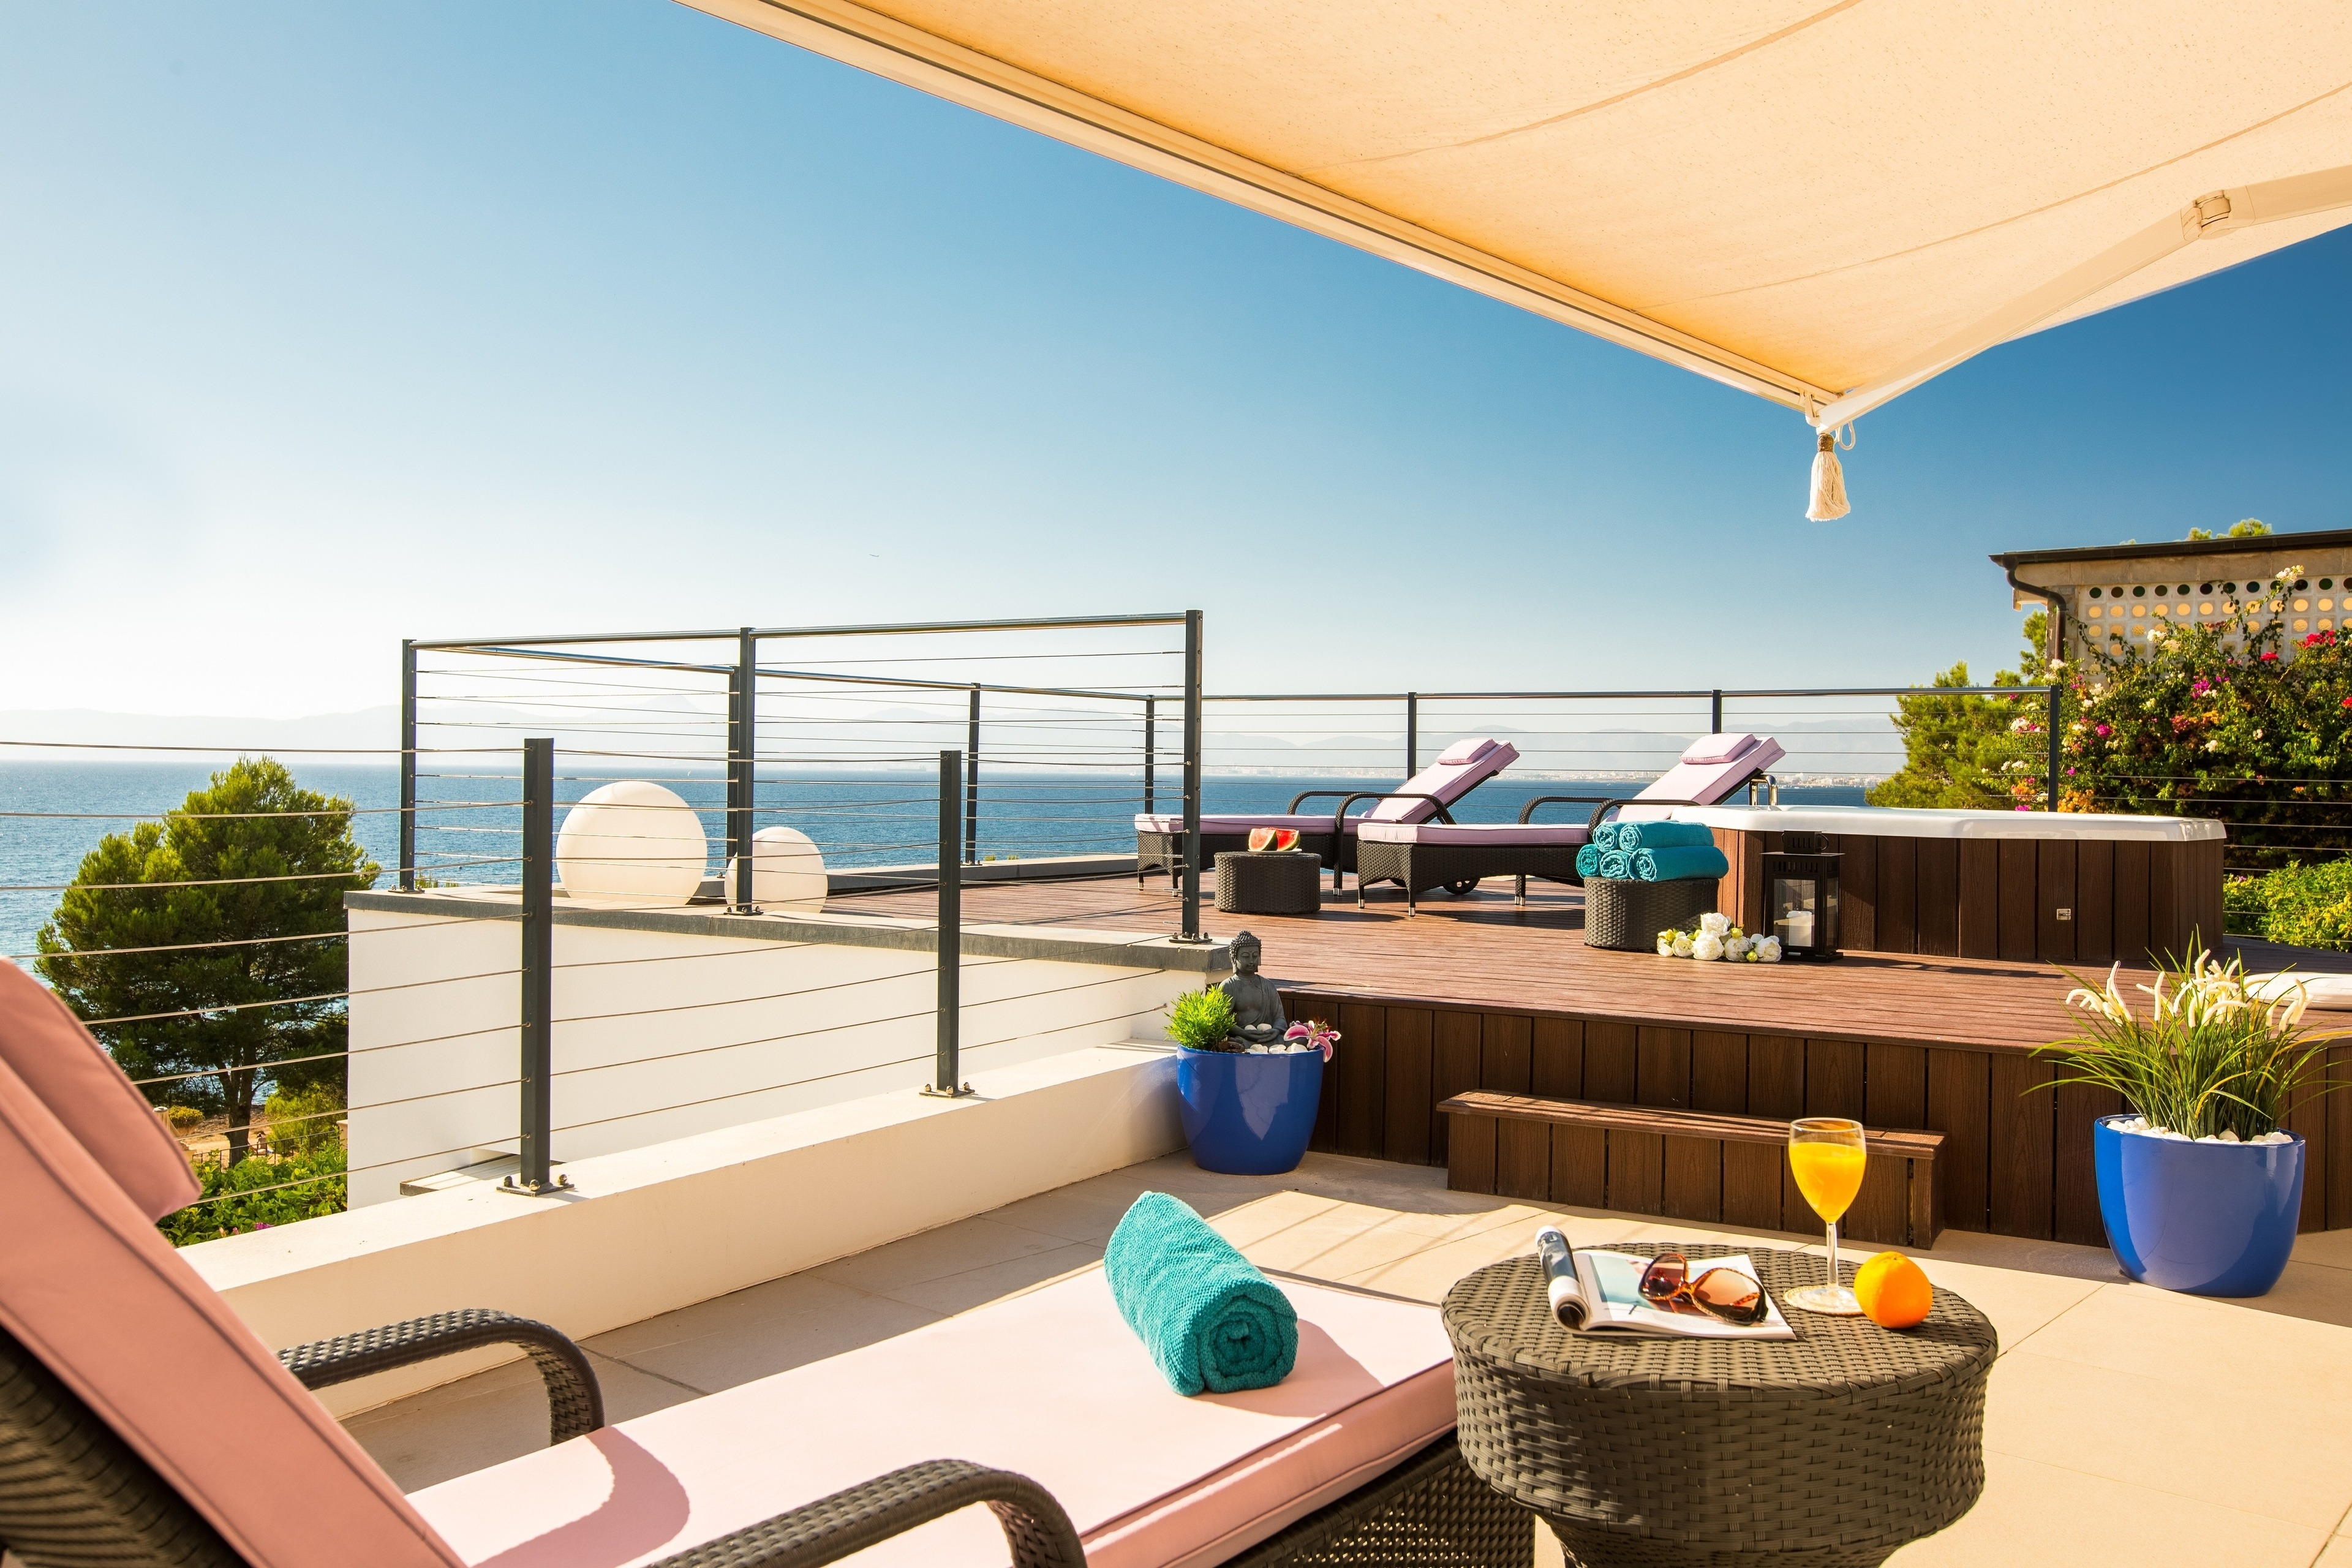 Casa Pura - Luxuriöses Ferienhaus mit Meerbli Ferienhaus in Spanien